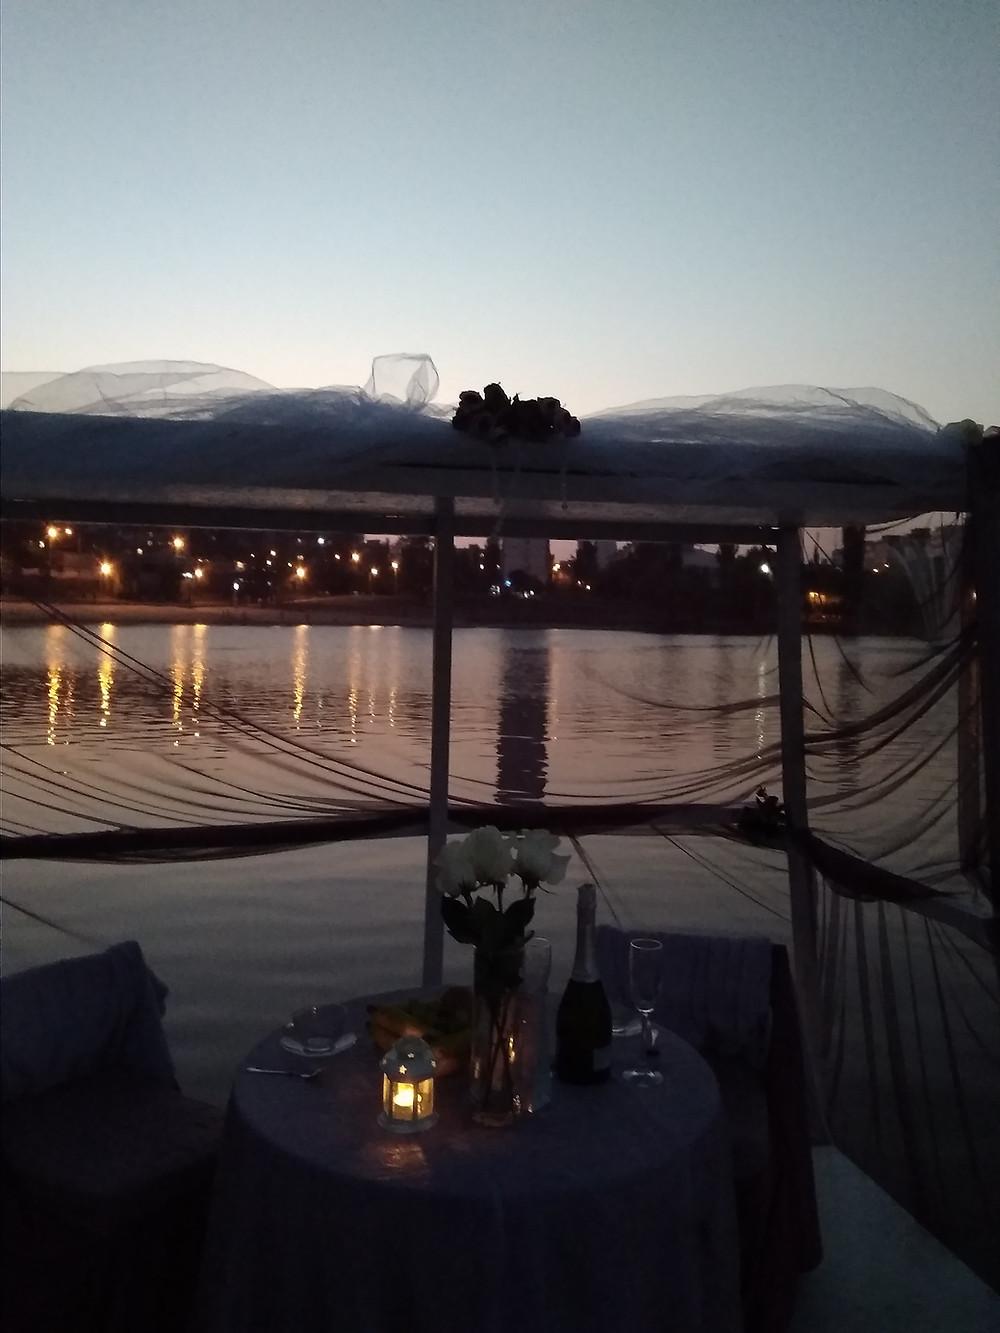 Альтечо, Романтический ужин на плоту посреди озера 12